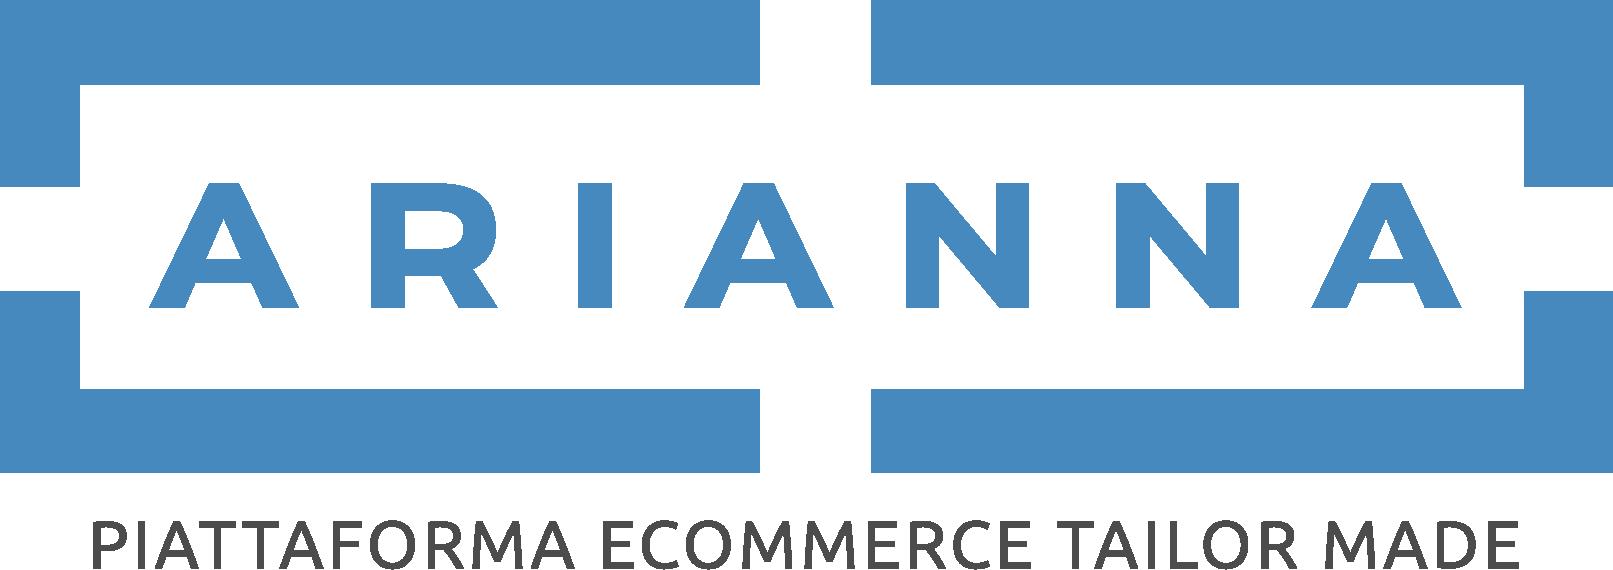 wp-content/uploads/logo-piattaforme/Arianna.png